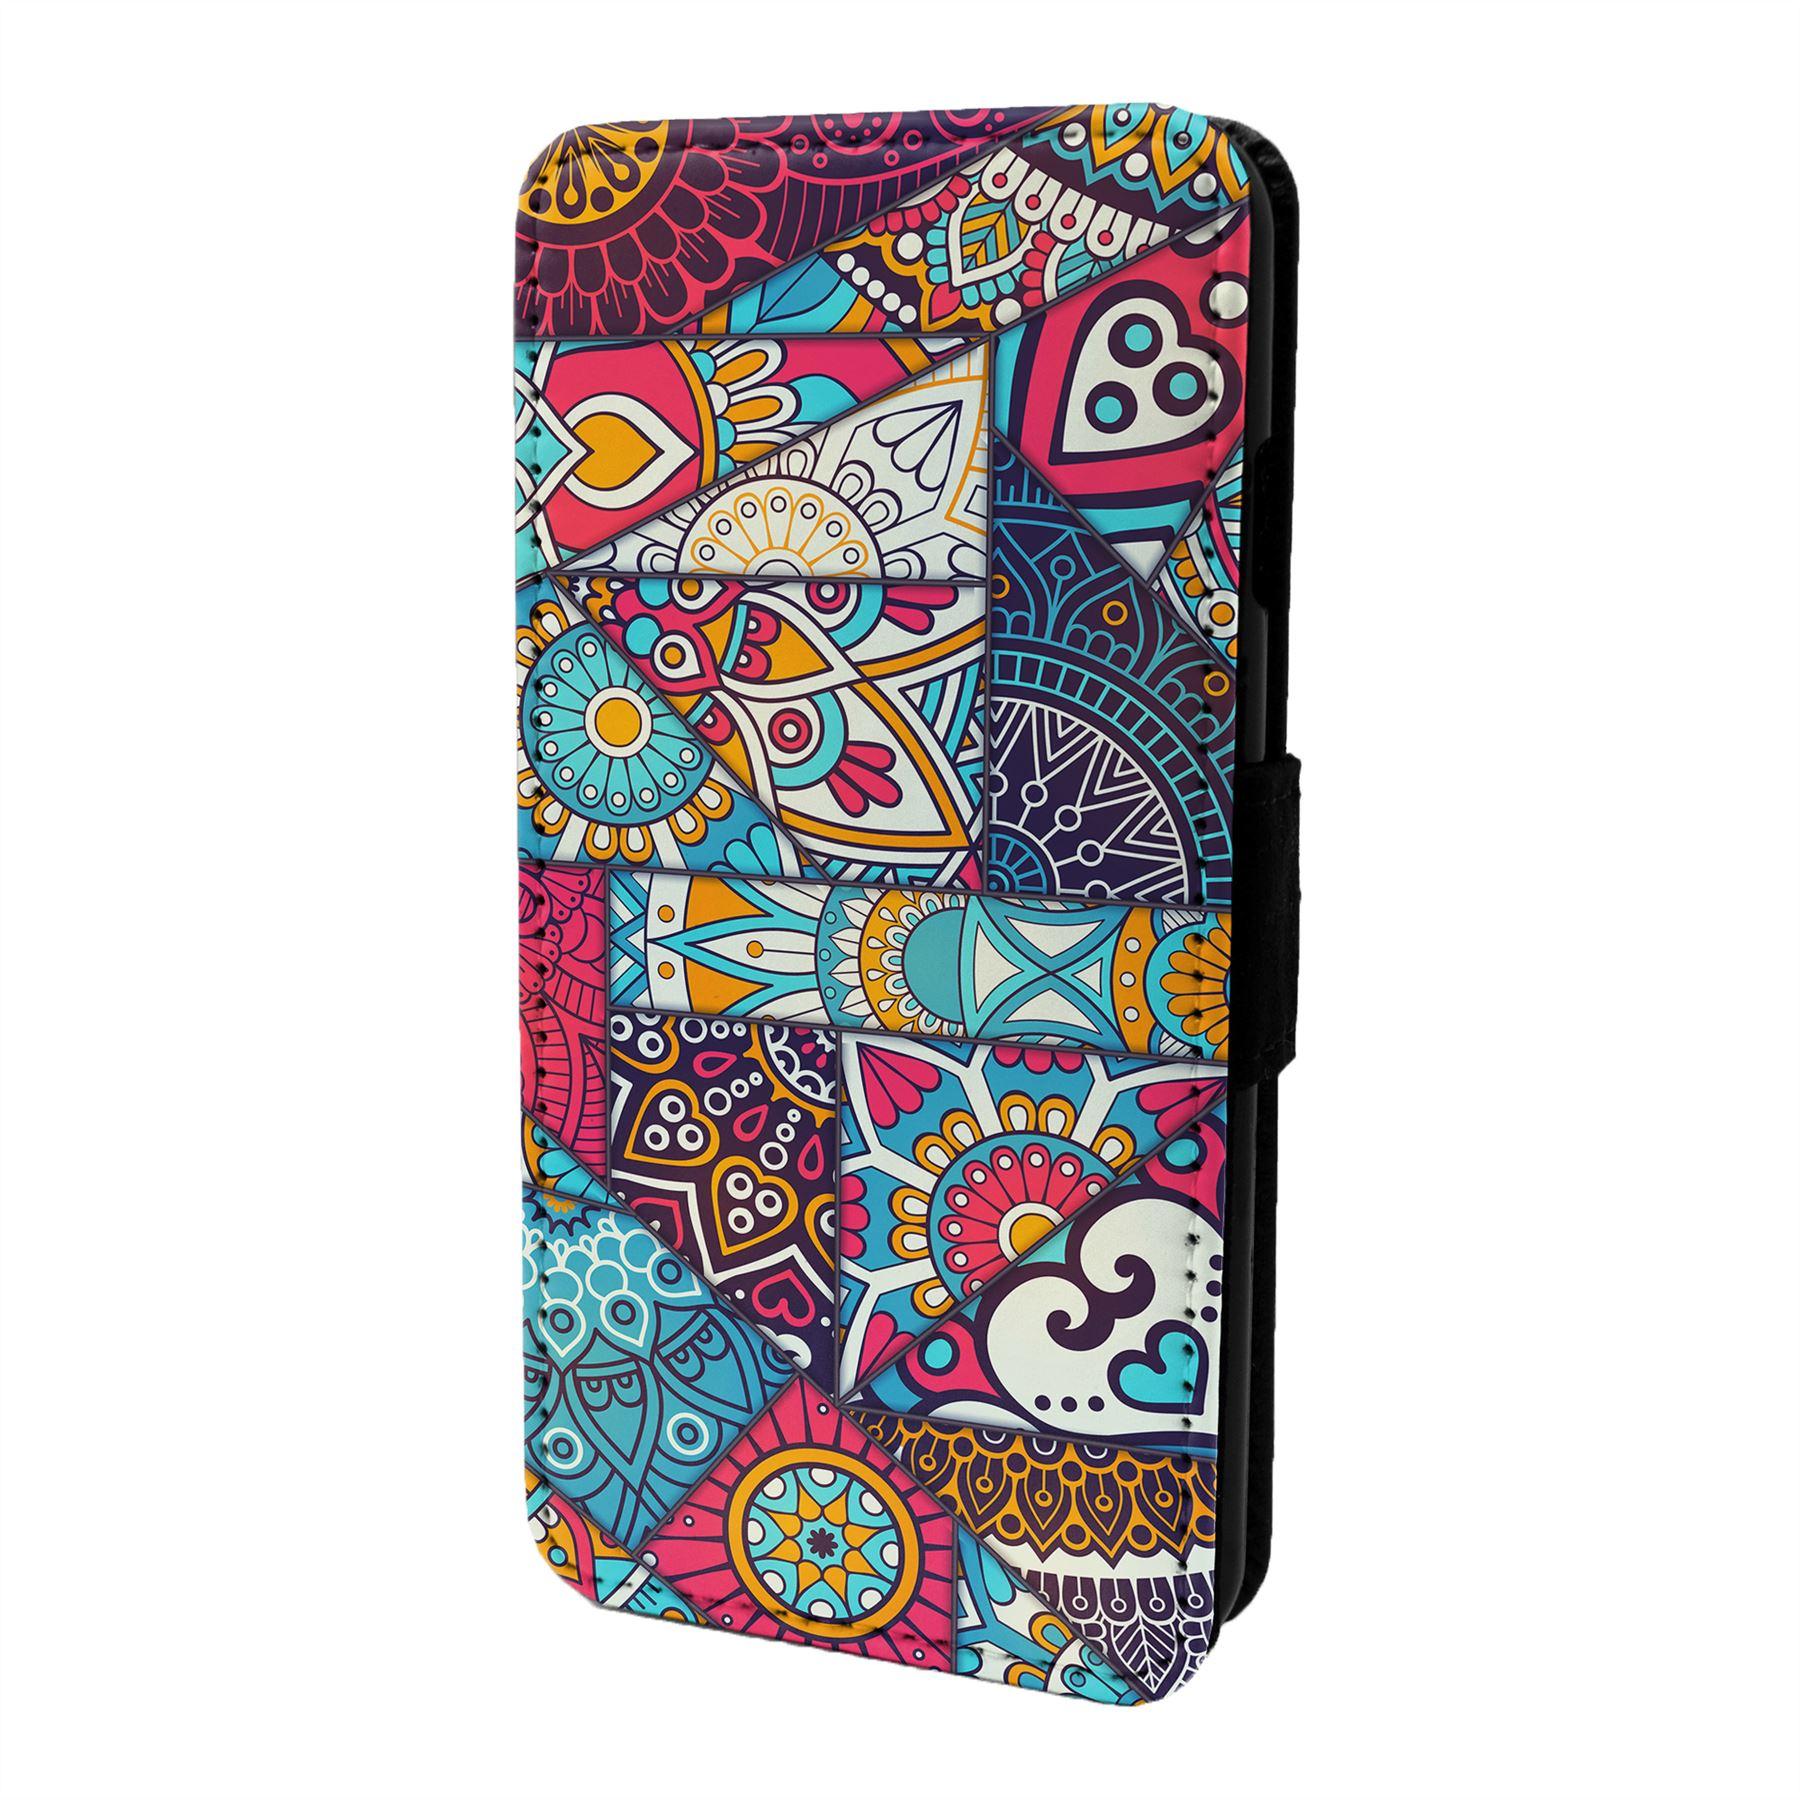 Mandala-Marroqui-Estampado-Funda-Libro-para-Telefono-Movil-S6893